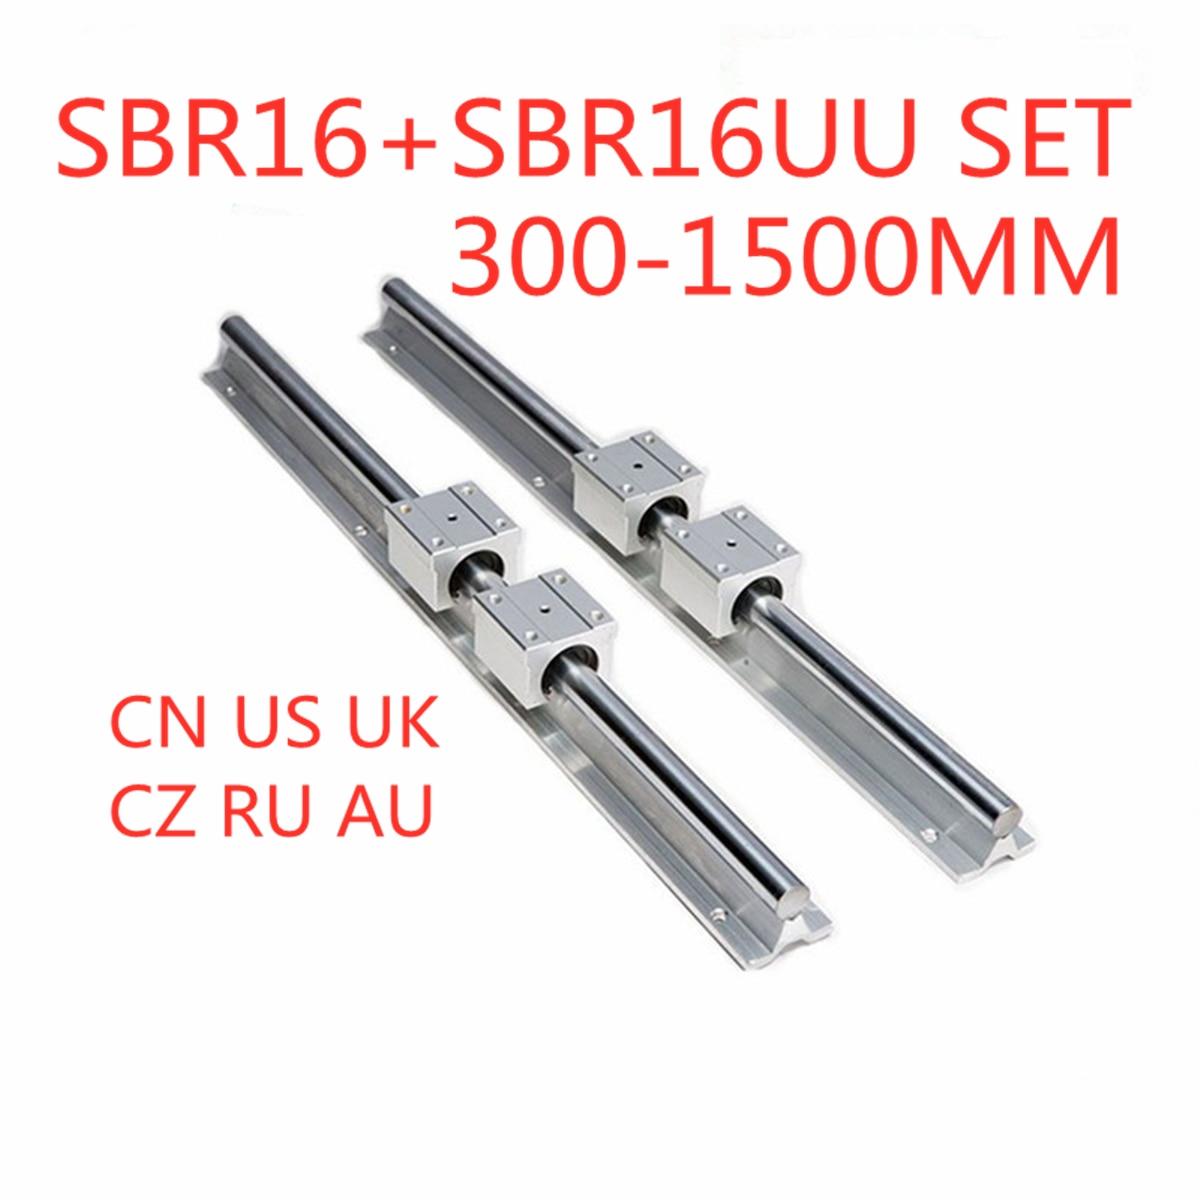 2Pcs SBR16 Lineare Rotaia di Guida 300 400 500 600 1000 1200 1500 millimetri + 4pcs SBR16UU Cuscinetto Lineare blocco di Guida Lineare Set